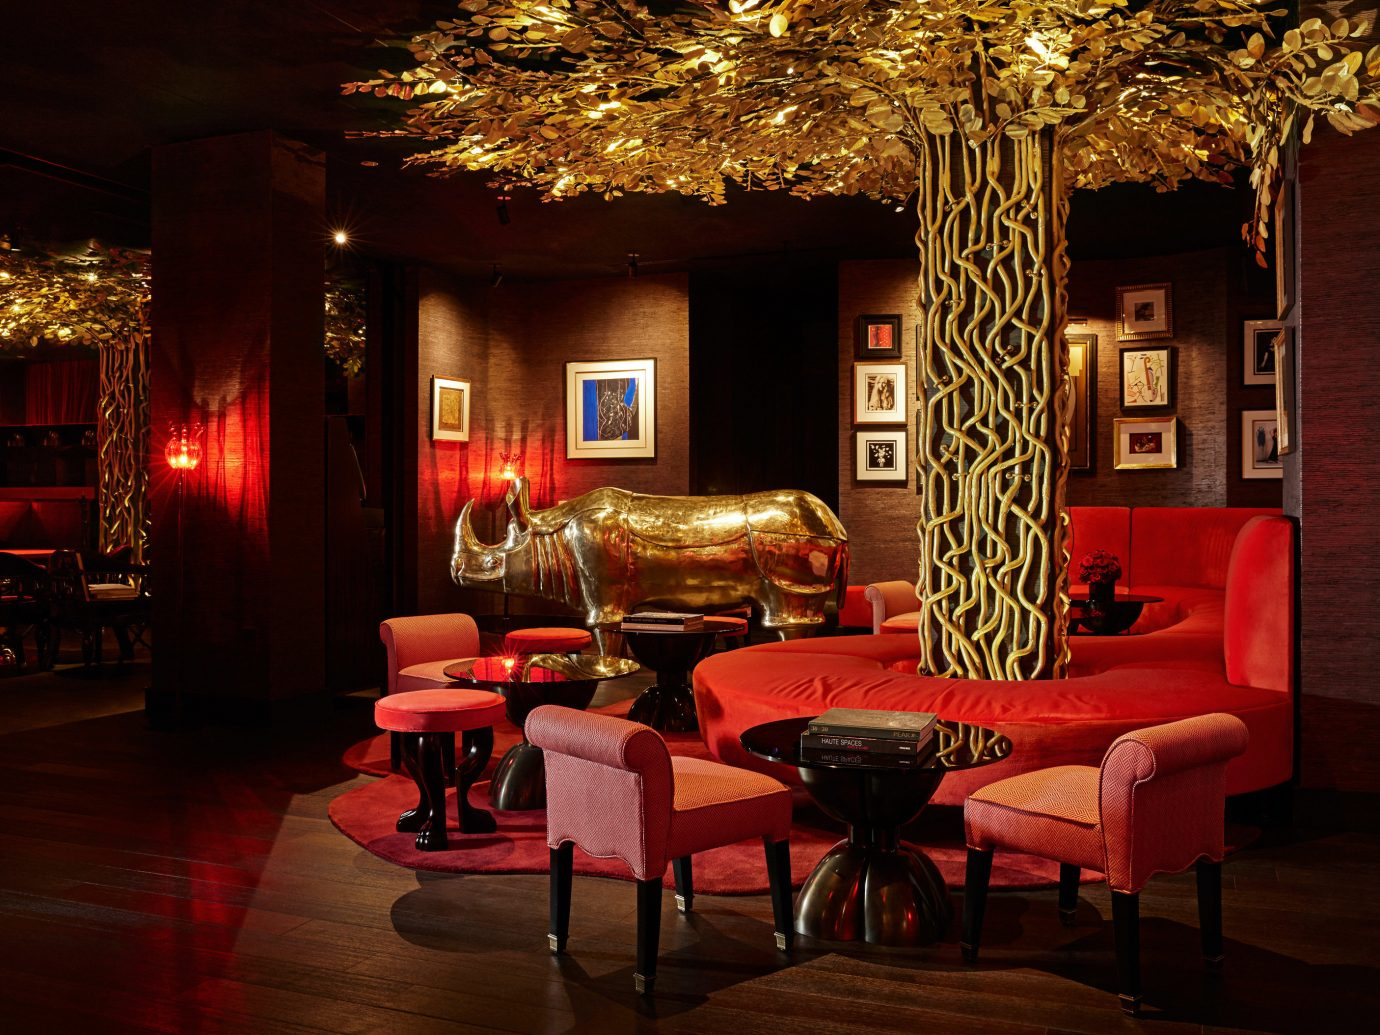 Hotels floor table indoor room Living restaurant lighting interior design estate Bar Lobby furniture dining table